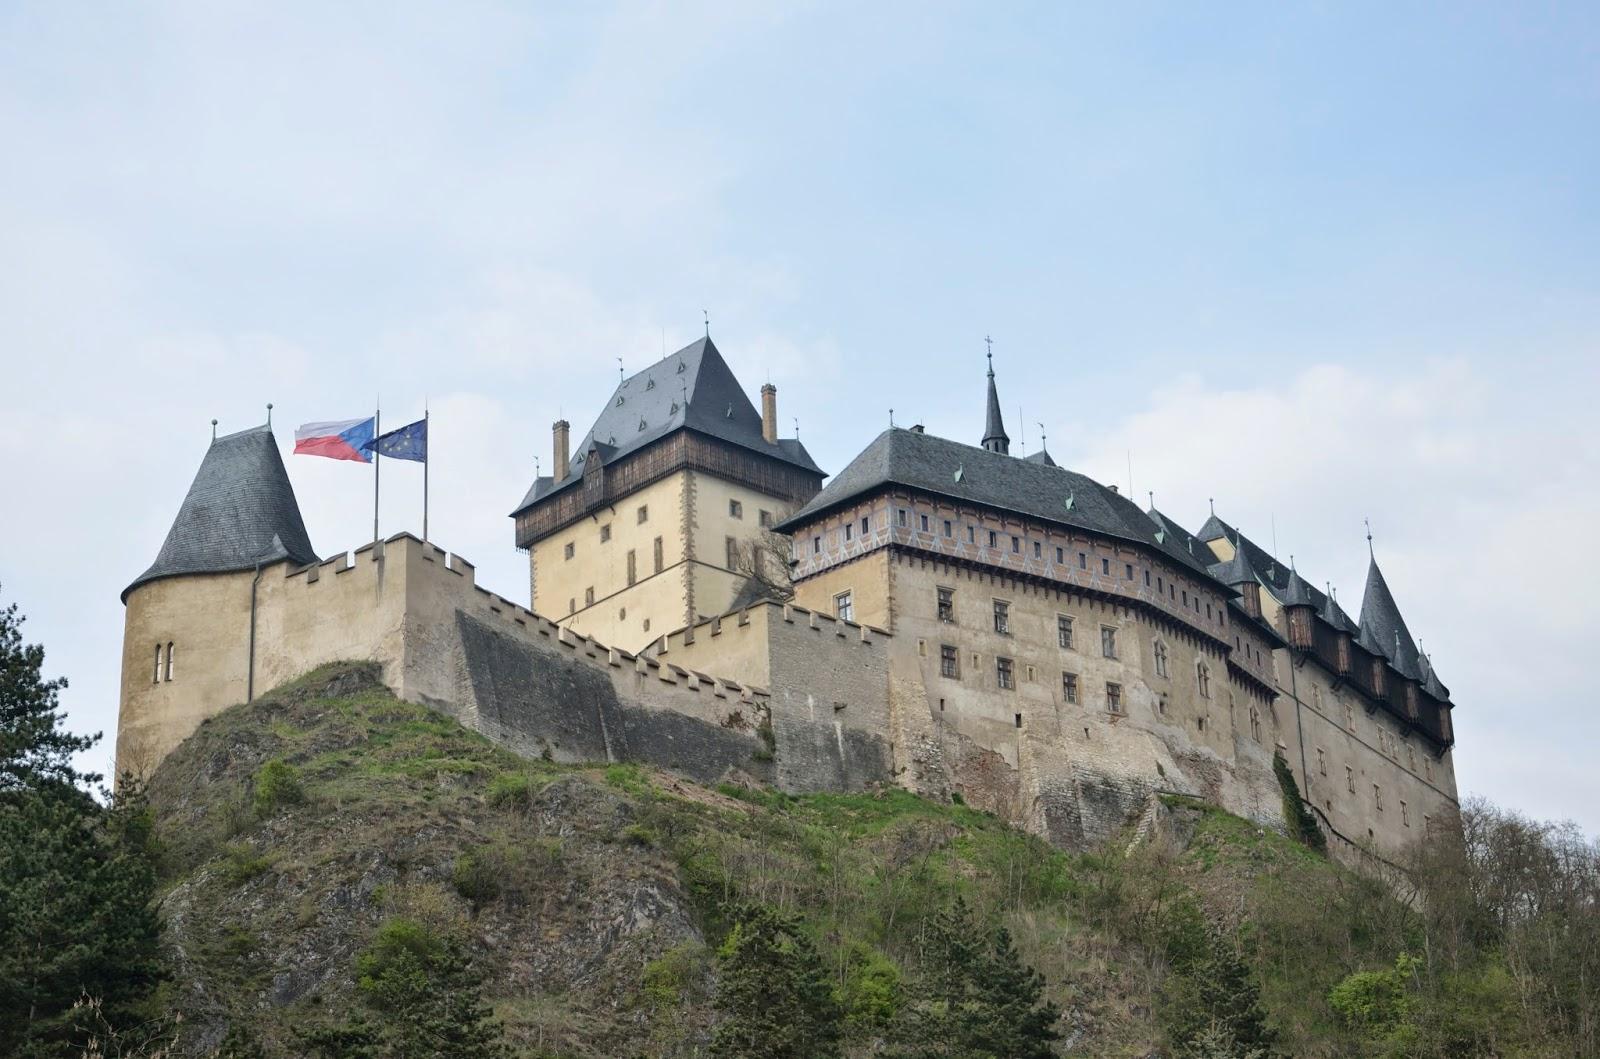 El castillo de Karlsteijn